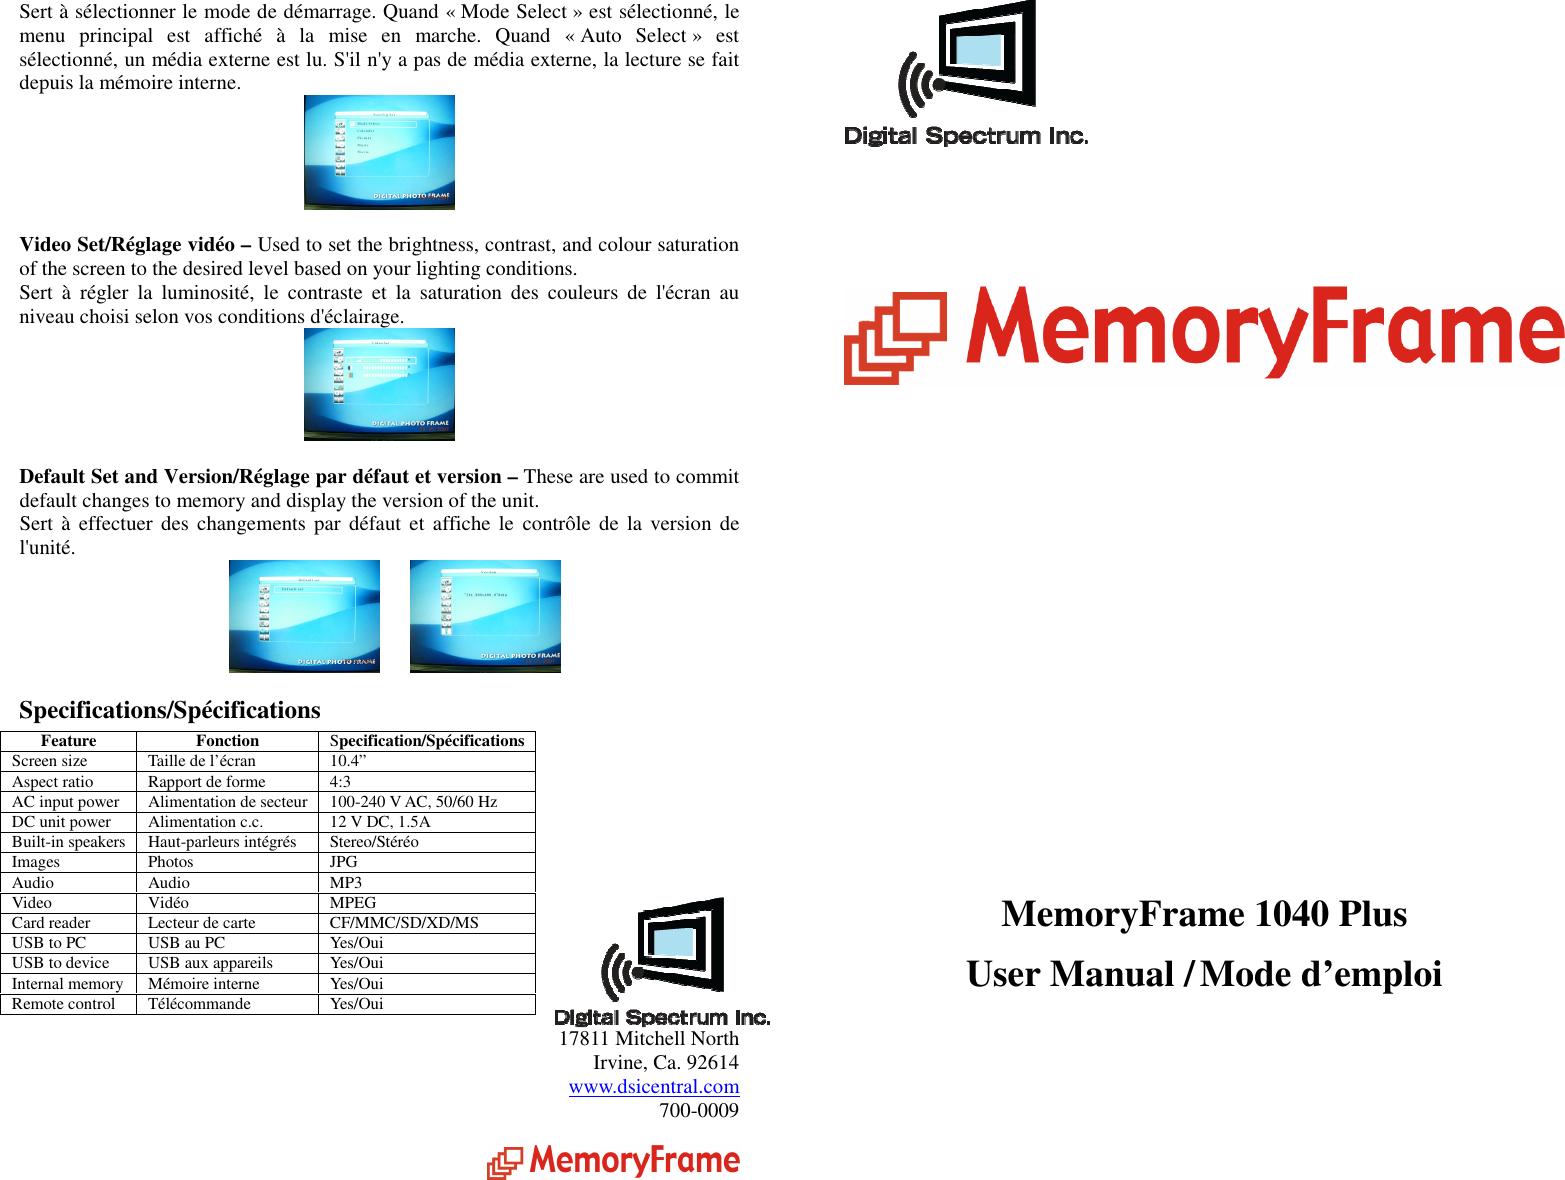 Digital spectrum memoryvue 1040 plus users manual memoryframe mf page 1 of 6 digital spectrum digital spectrum memoryvue 1040 publicscrutiny Images